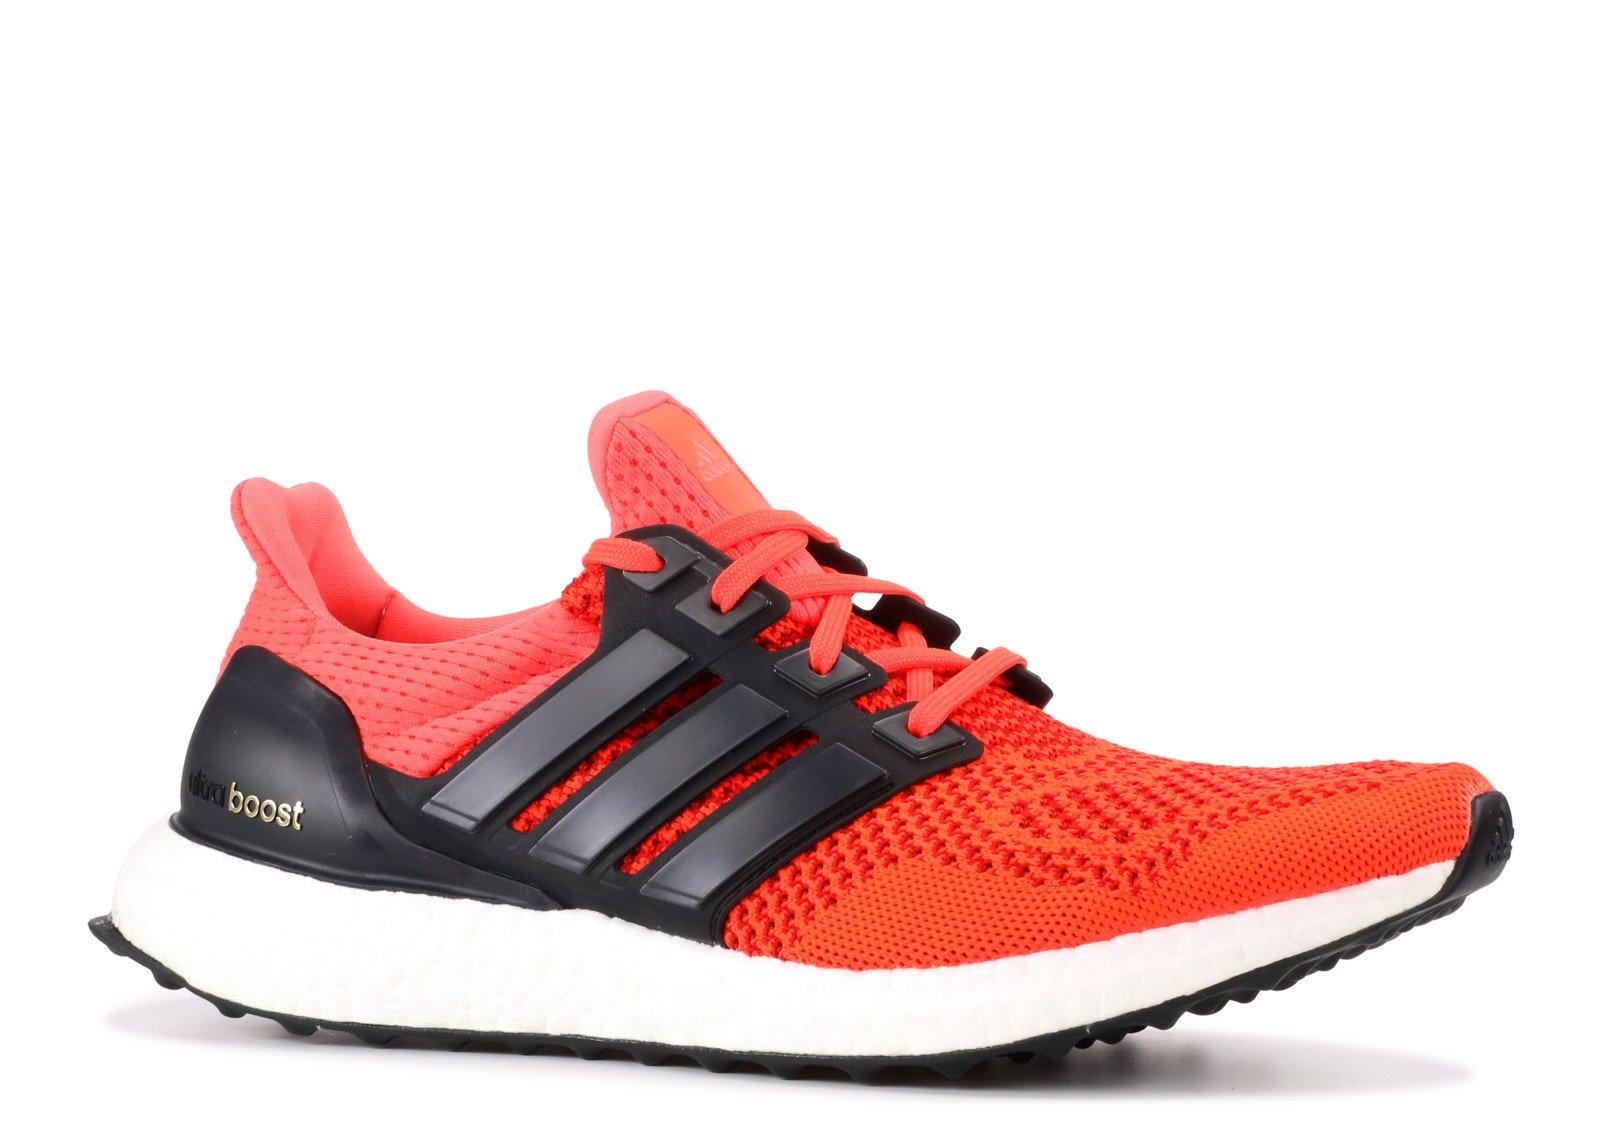 71qfn46TyLL - adidas Men's Ultra Boost M Running Shoes